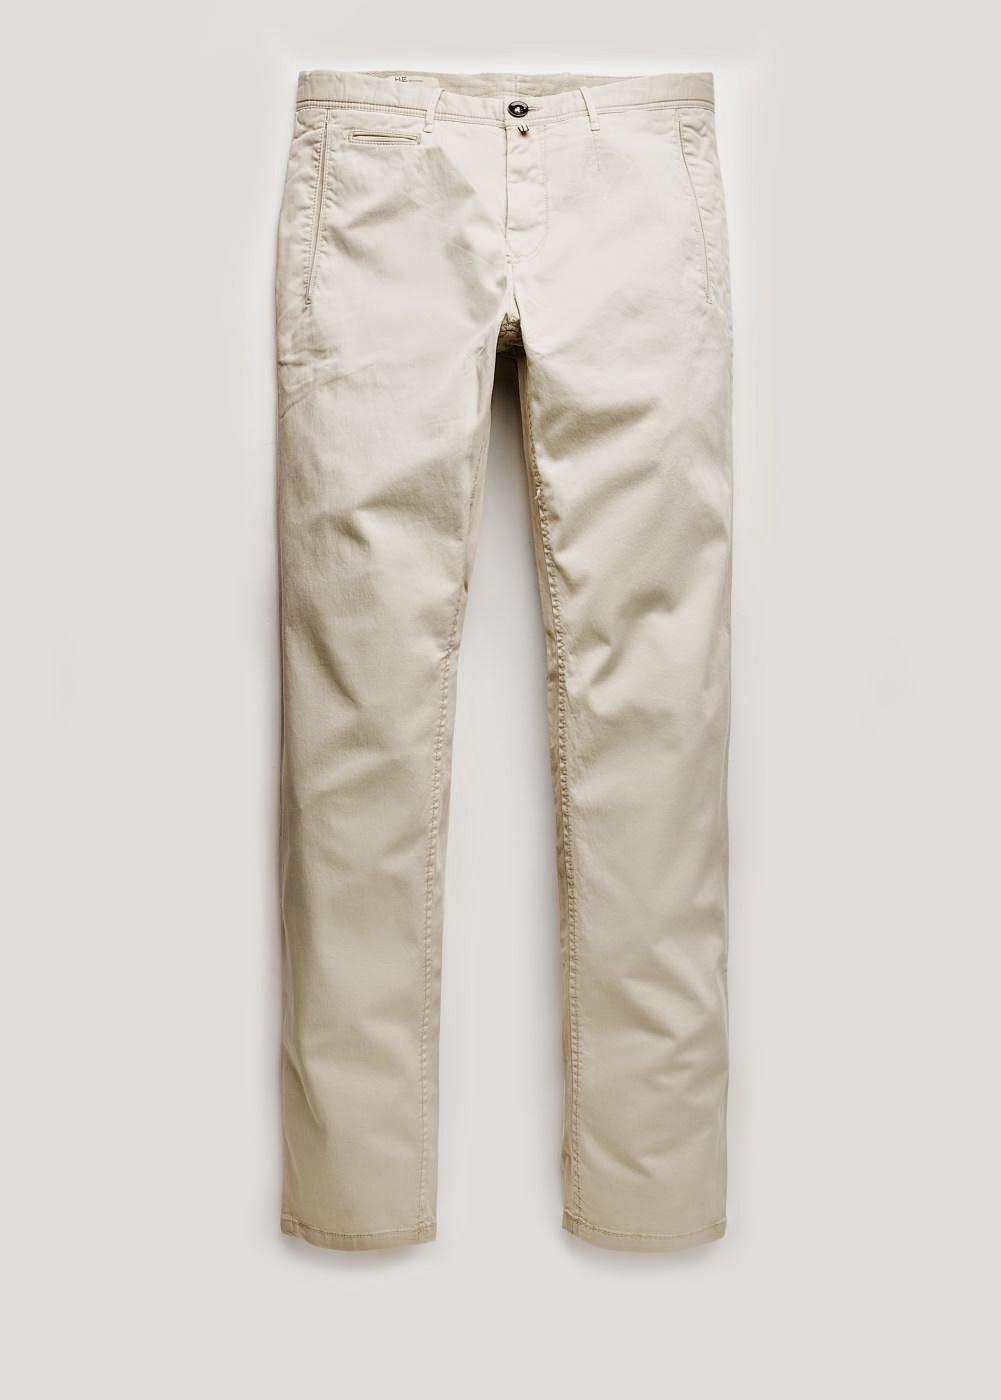 http://shop.mango.com/ES/p0/hombre/prendas/pantalones/chino-garment-dyed/?id=33033006_92&n=1&s=prendas_he.pantalones_he&ident=0__0_1415113180873&ts=1415113180873